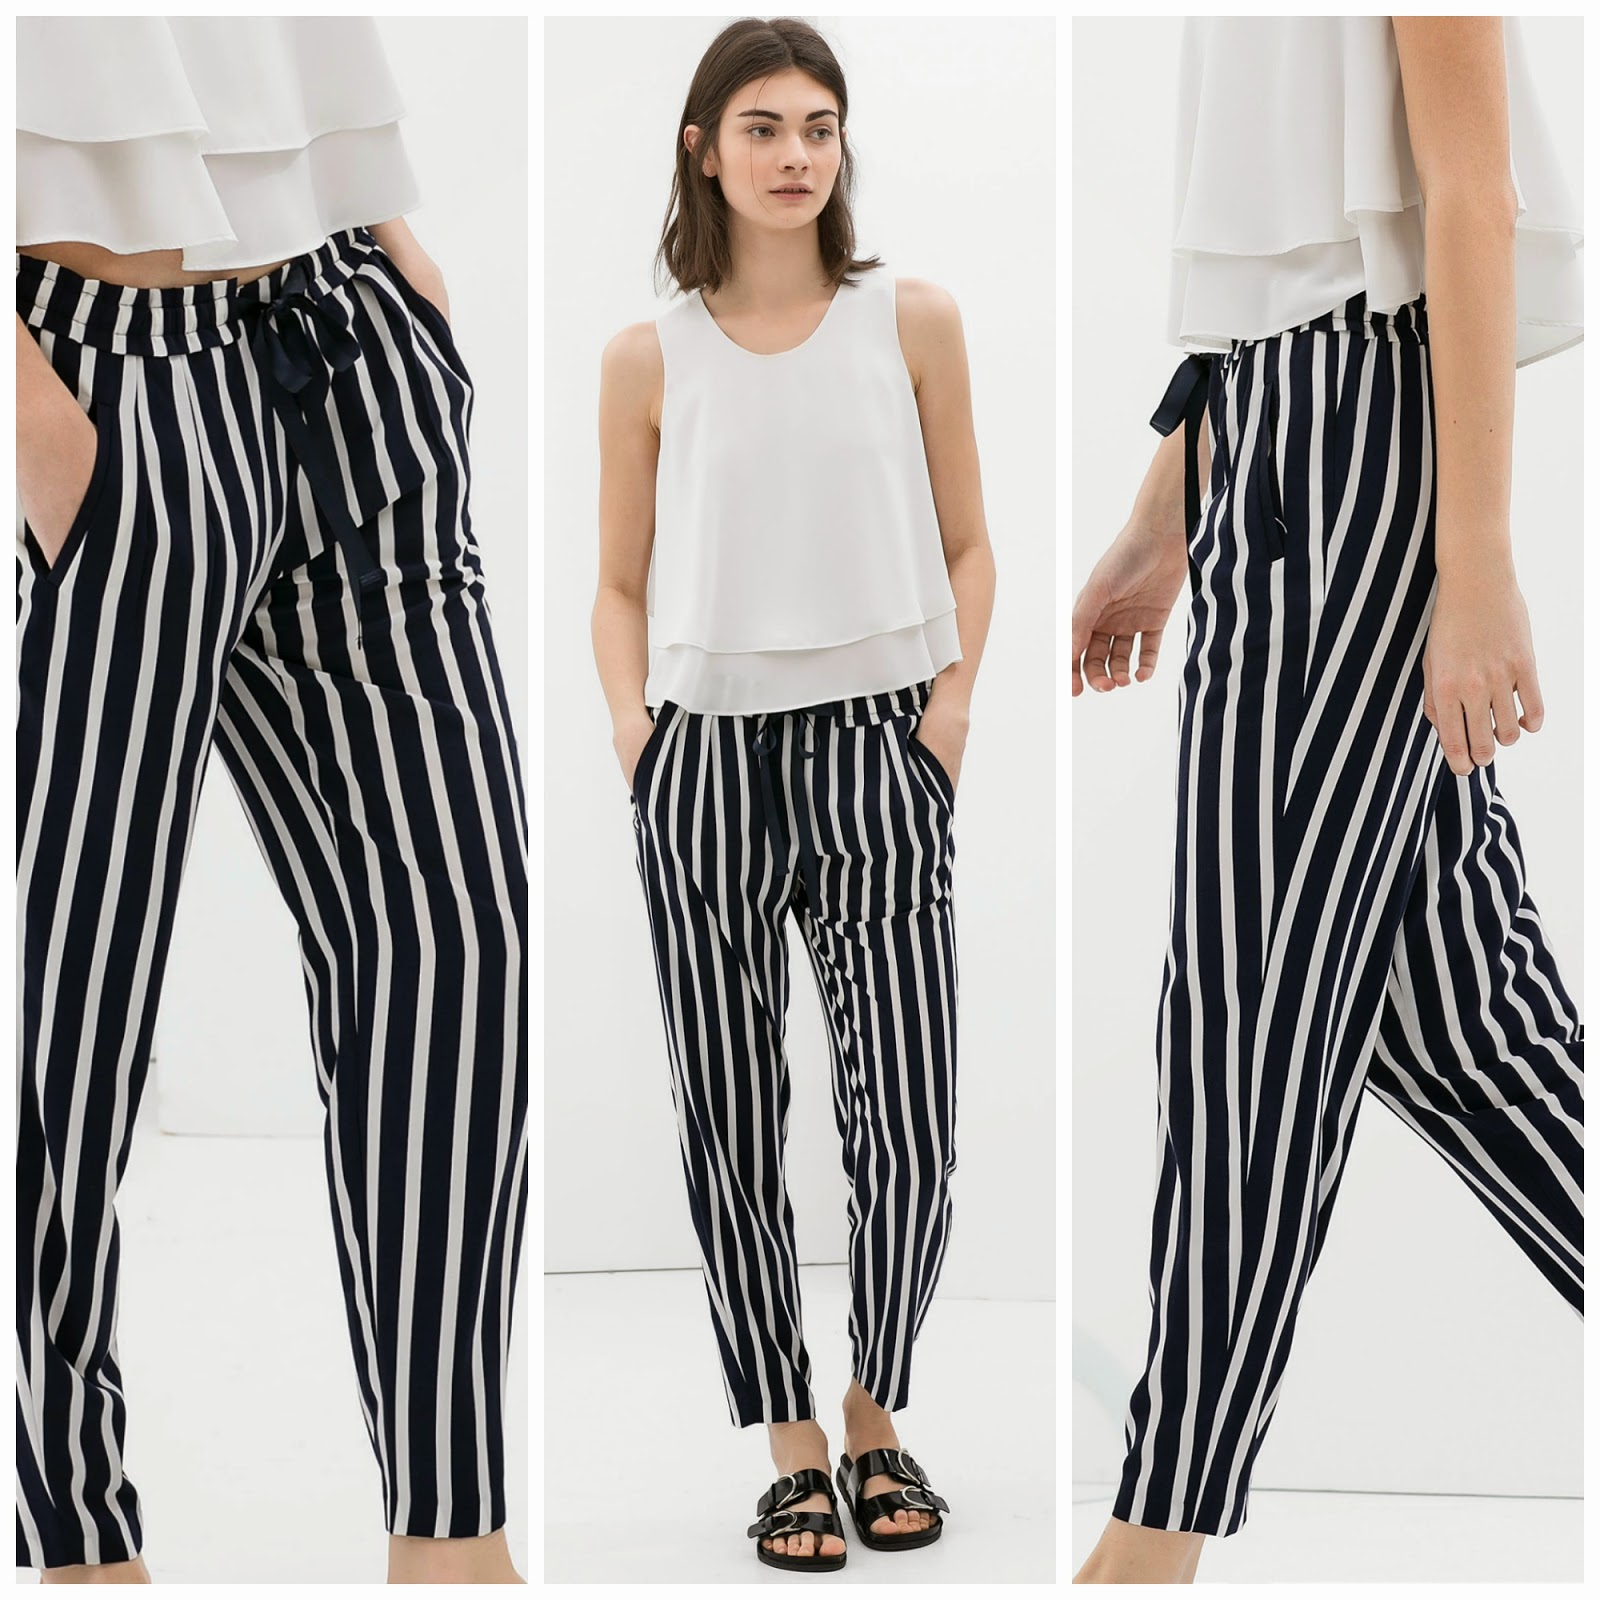 PICK OF THE WEEK: Striped Trousers (Zara)